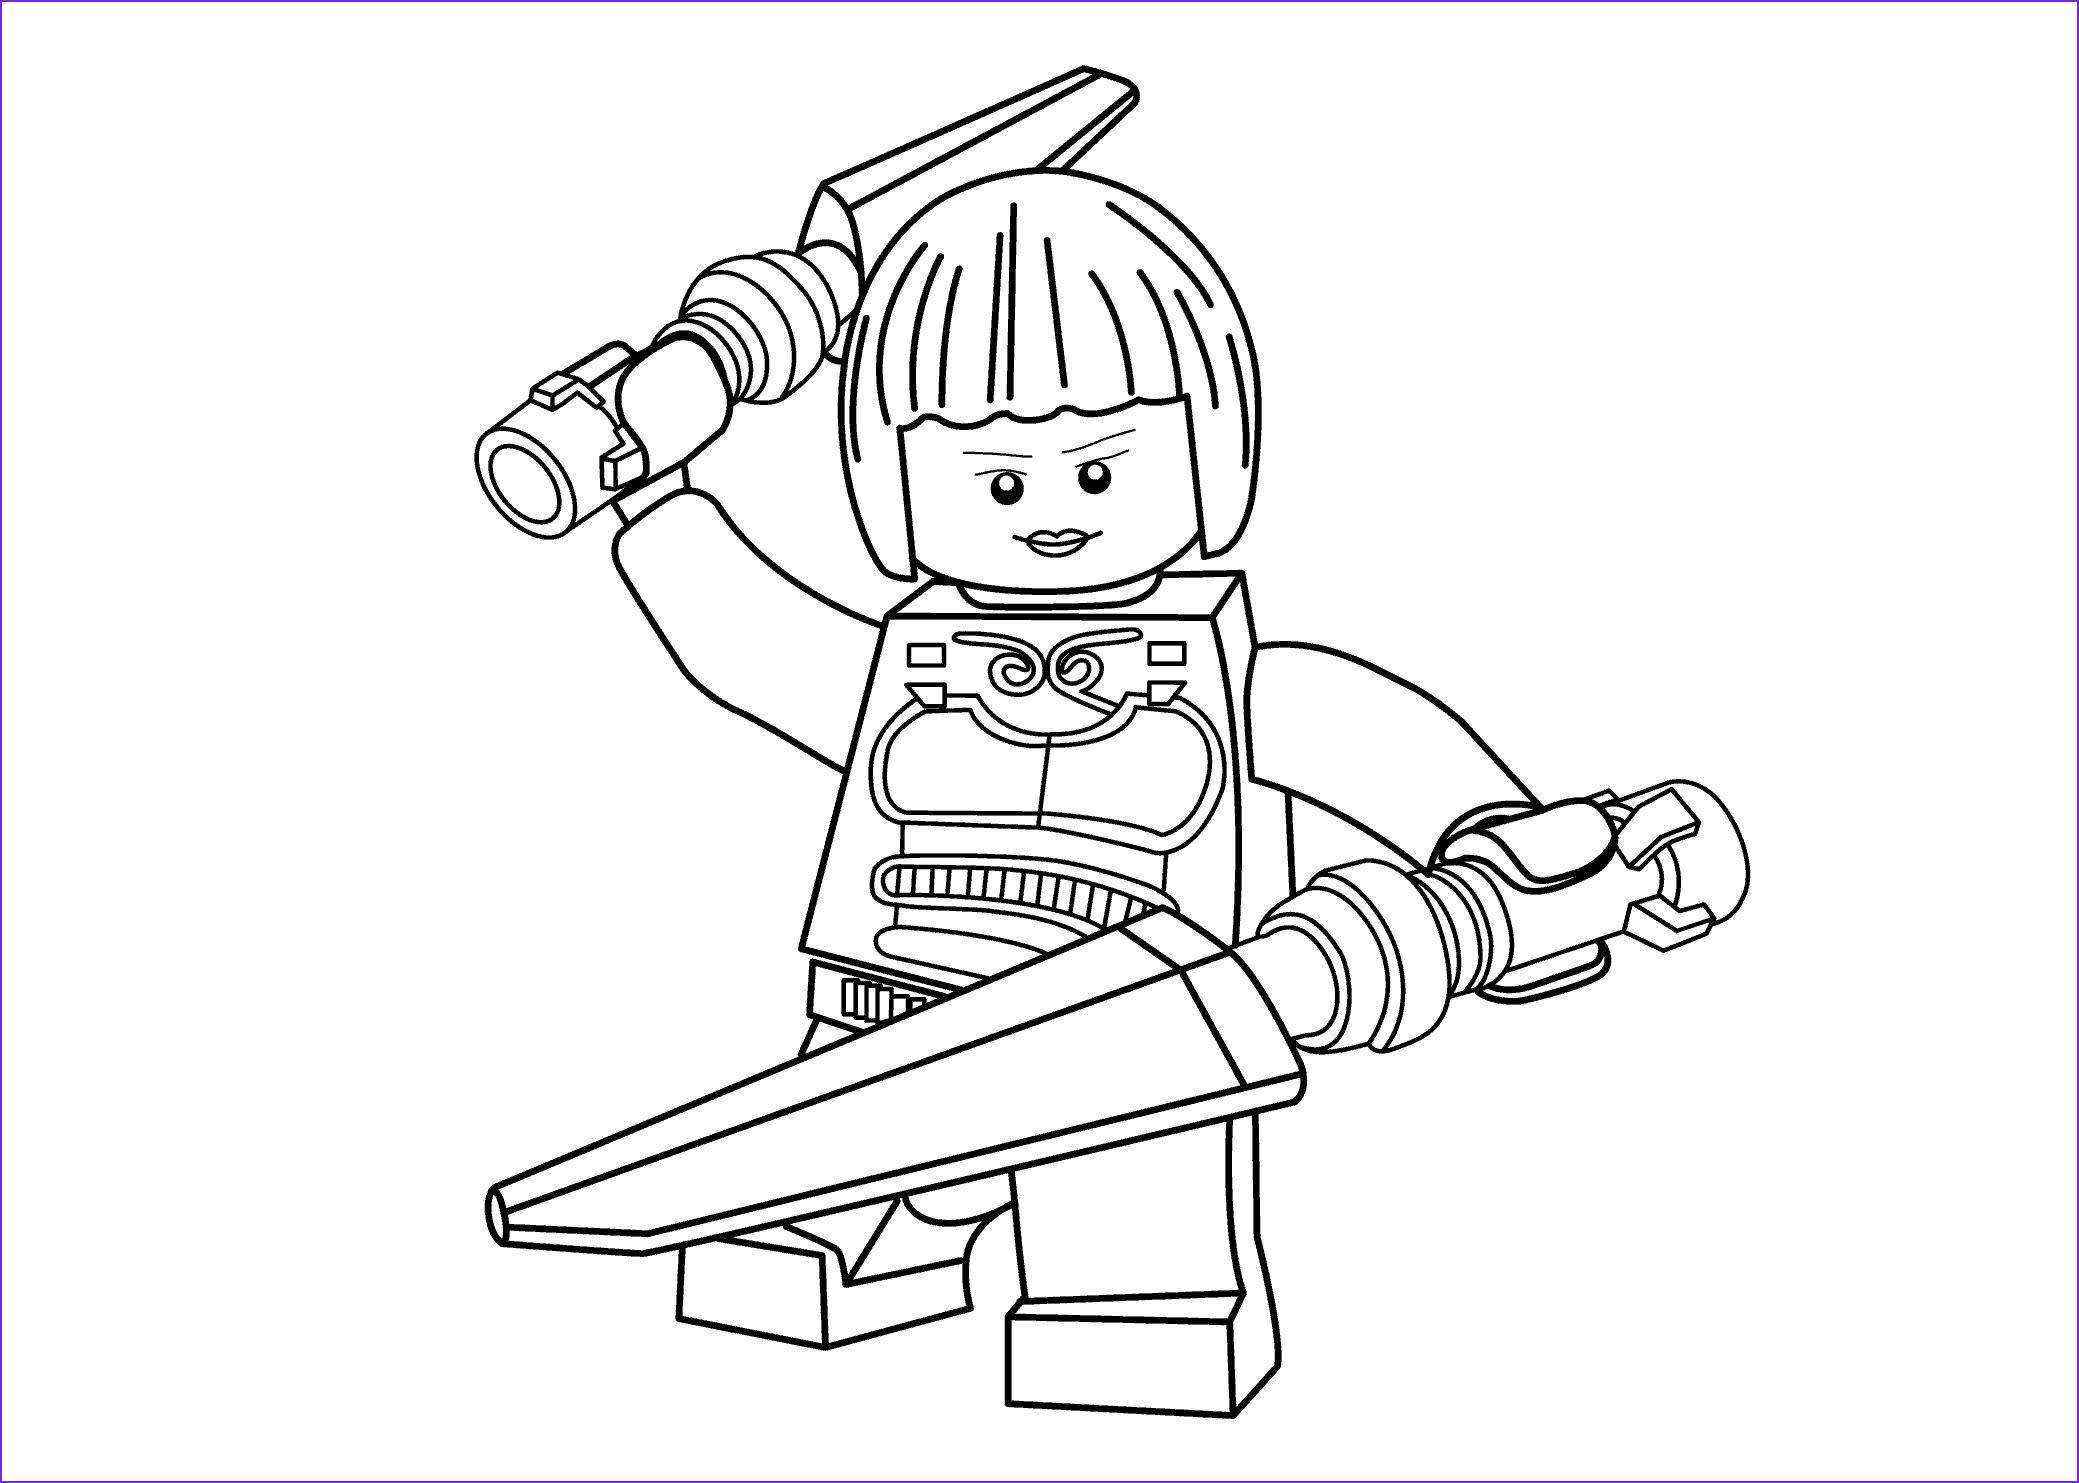 Princesse Nya Coloring Page For Girls Ninja Go Coloring Ninjago Coloring Pages Lego Coloring Pages Batman Coloring Pages